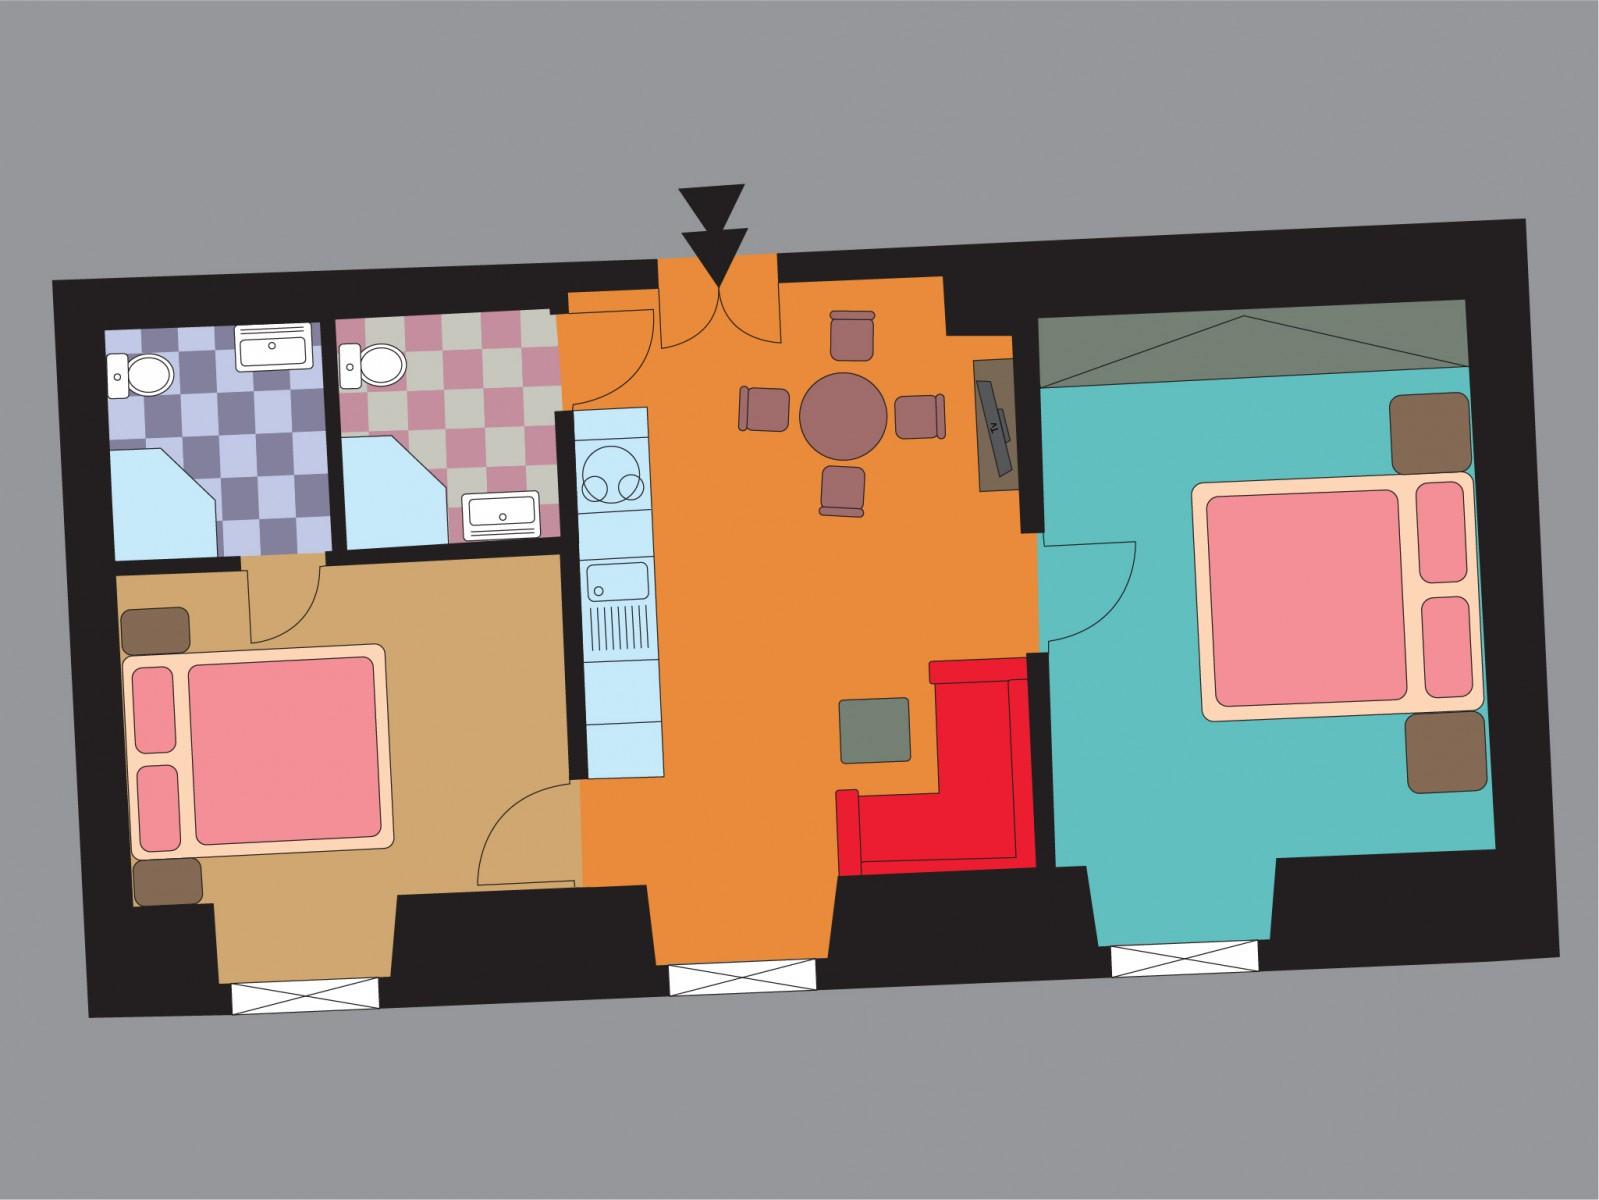 Gladiolus Floor Plan